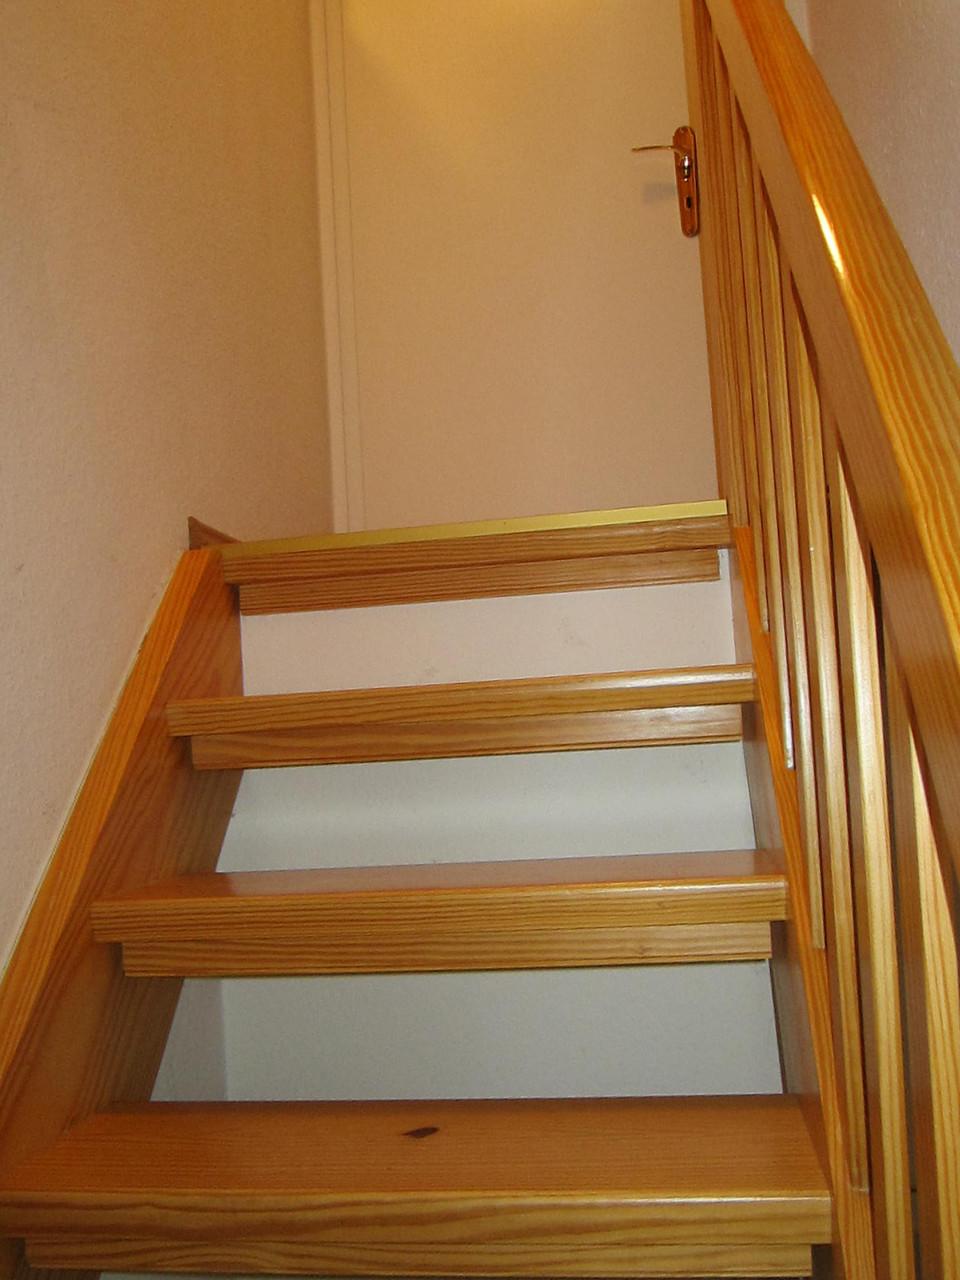 Holztreppe zum Dachzimmer